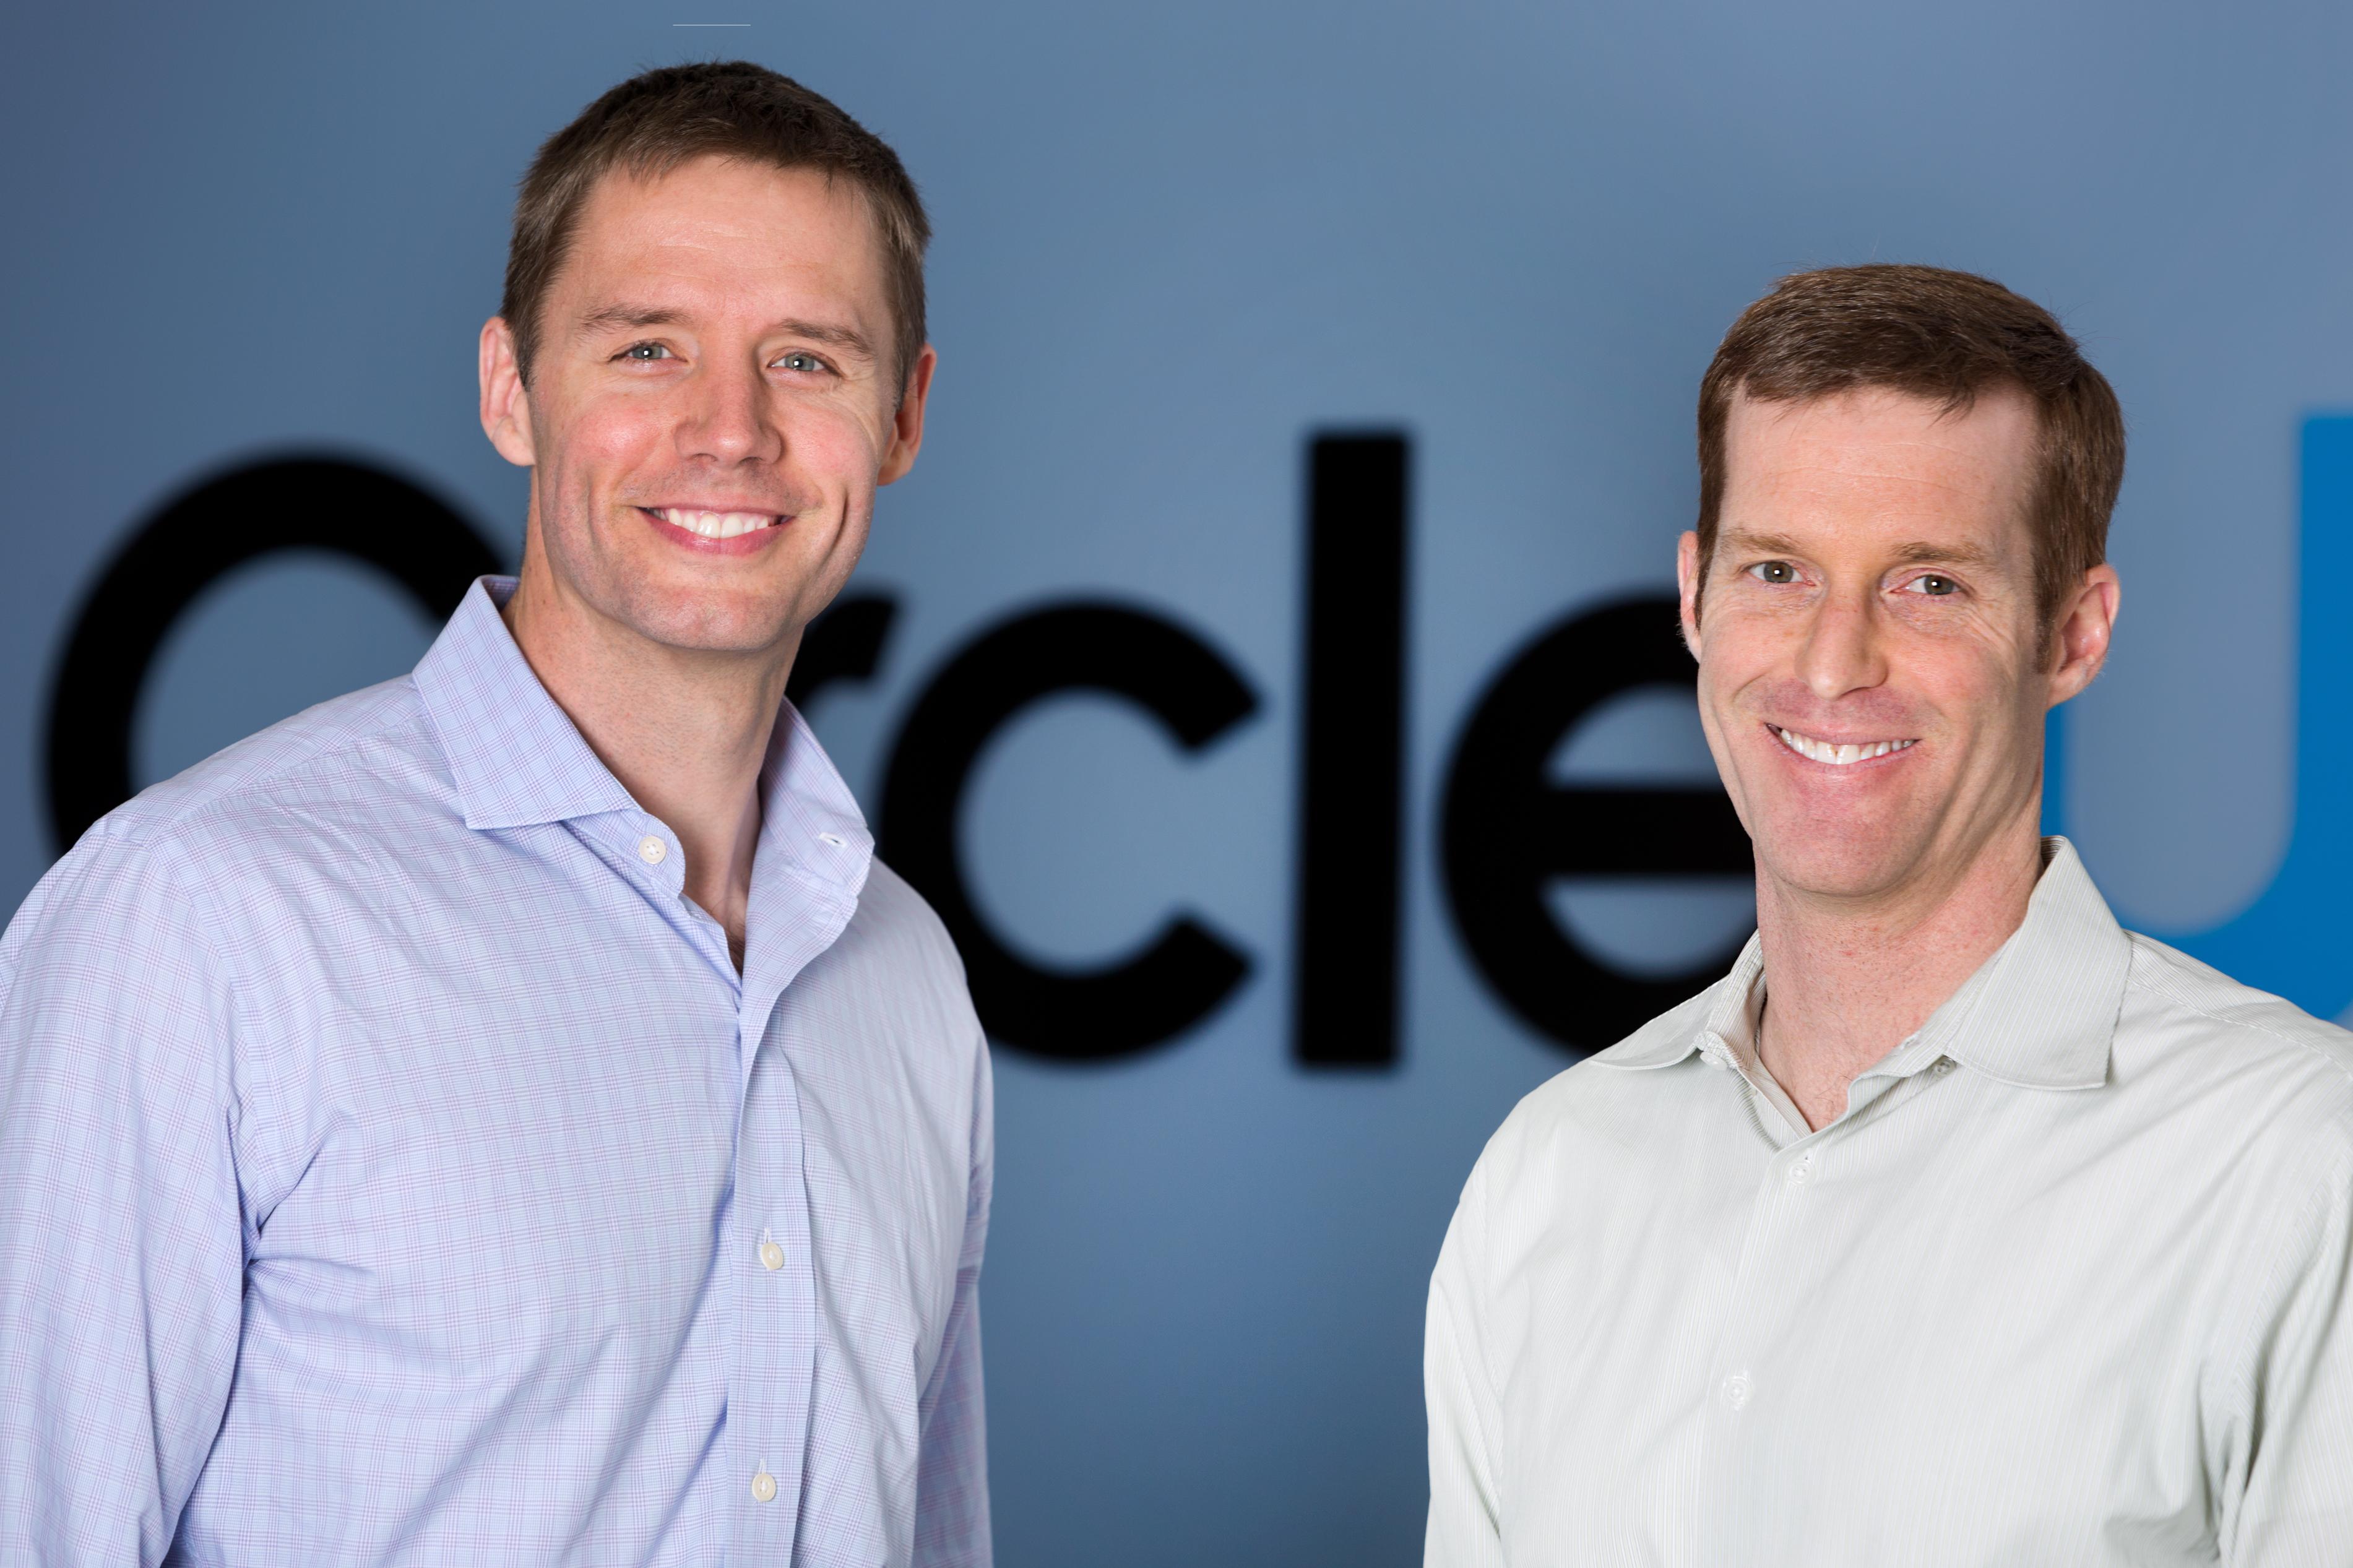 Ryan Caldbeck and Rory Eakin, CEO and COO of CircleUp